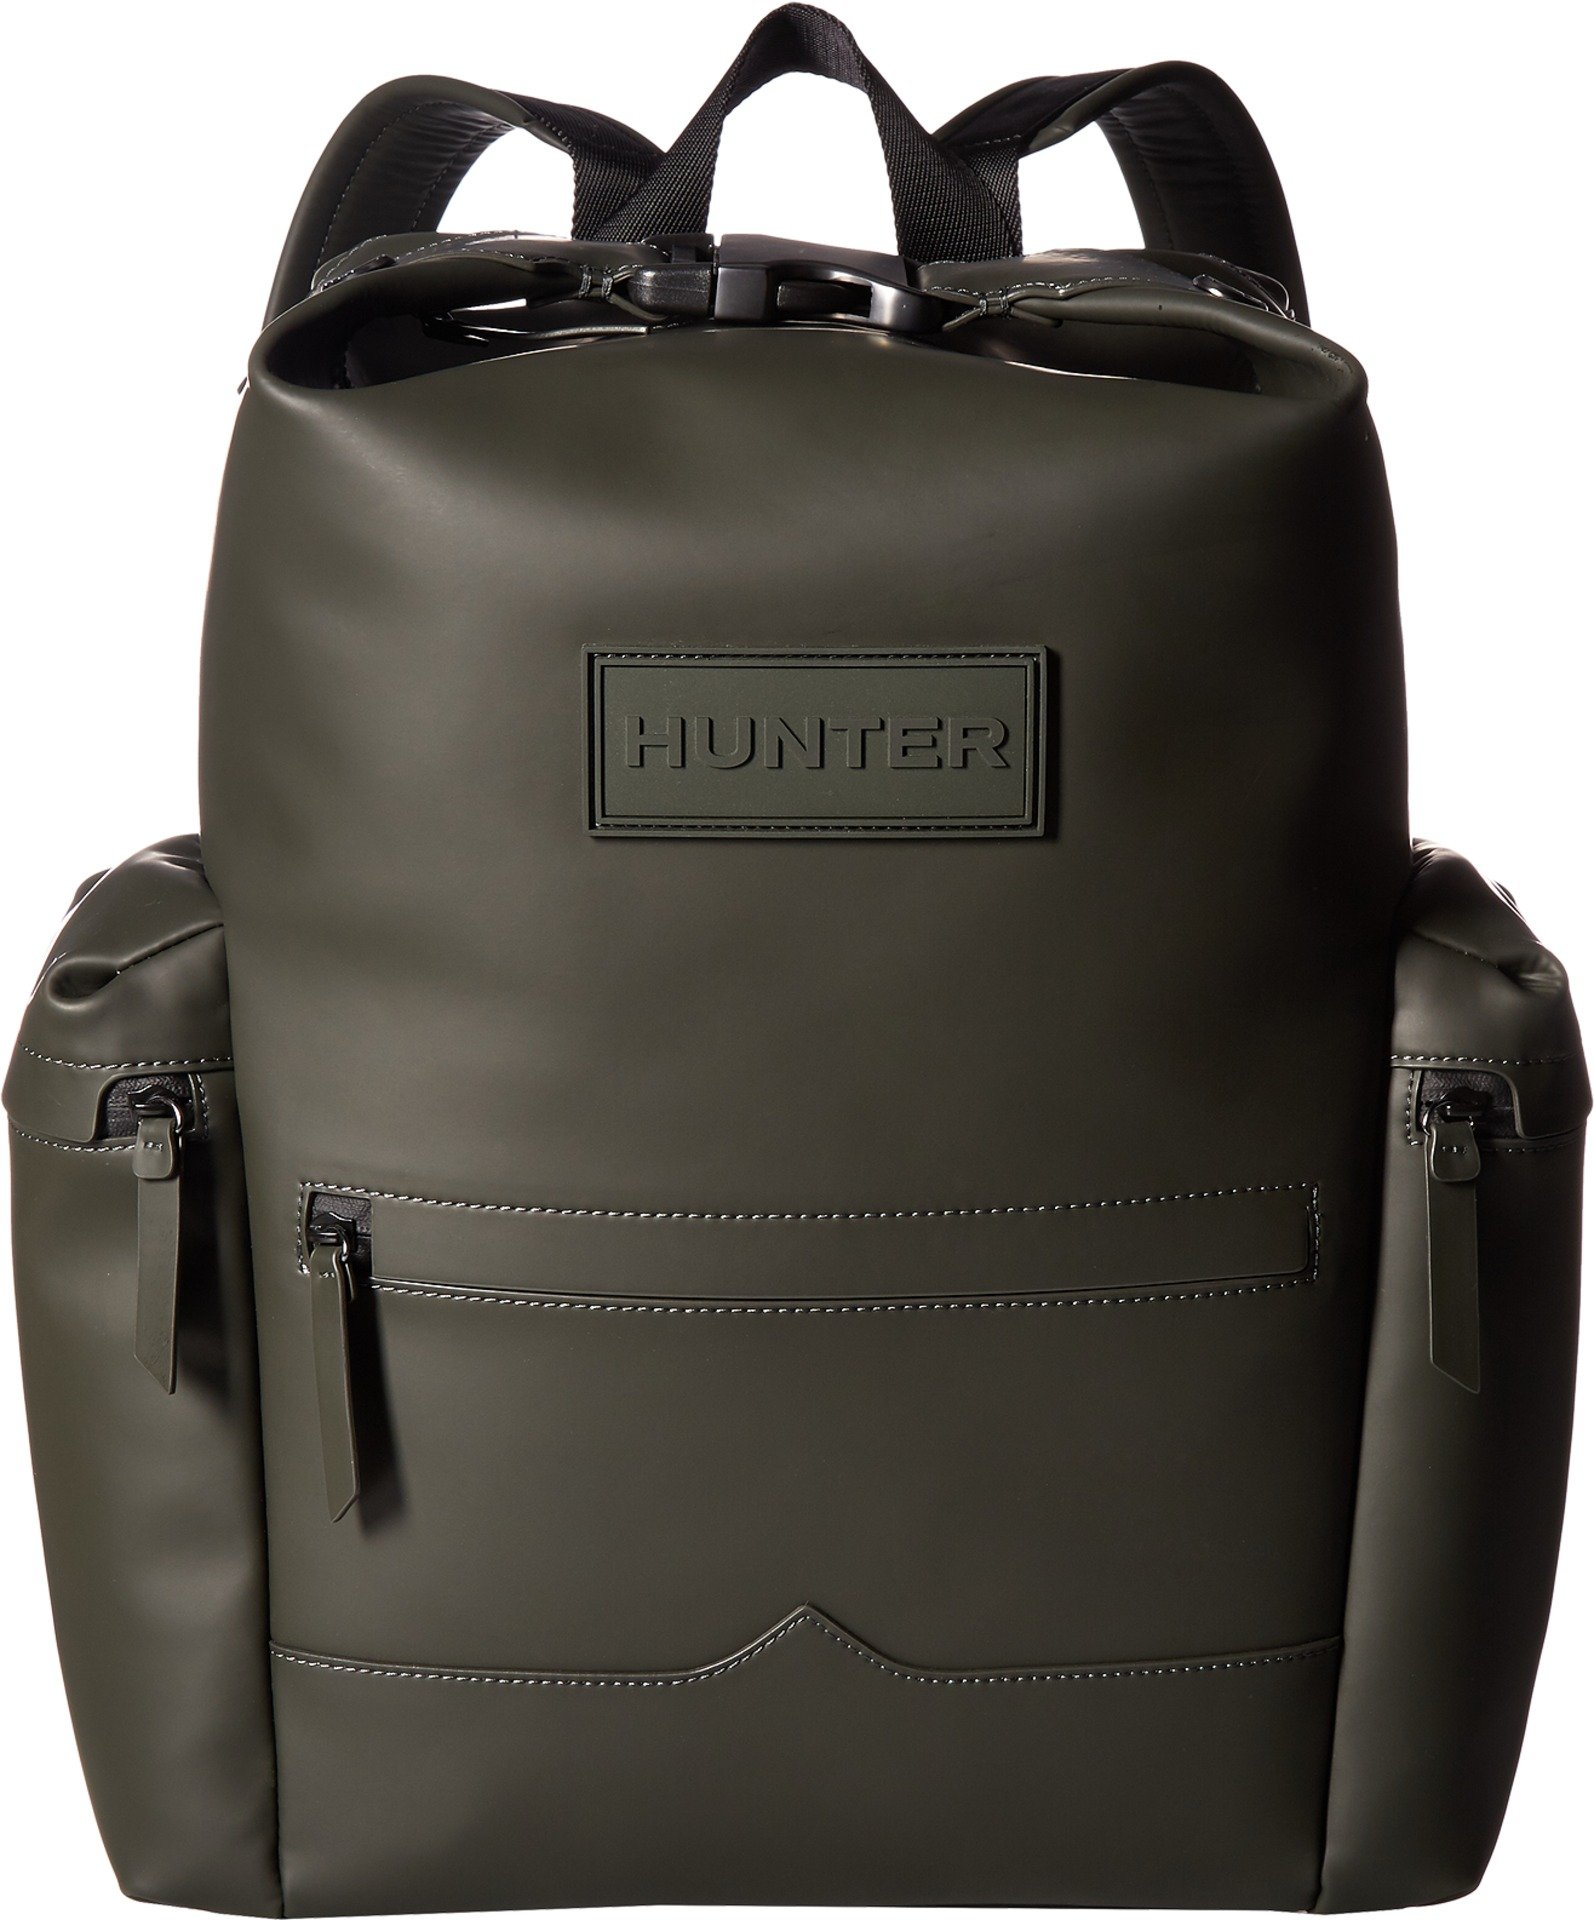 Hunter Boots Men's Original Rubberised Leather Backpack, Dark Olive, One Size